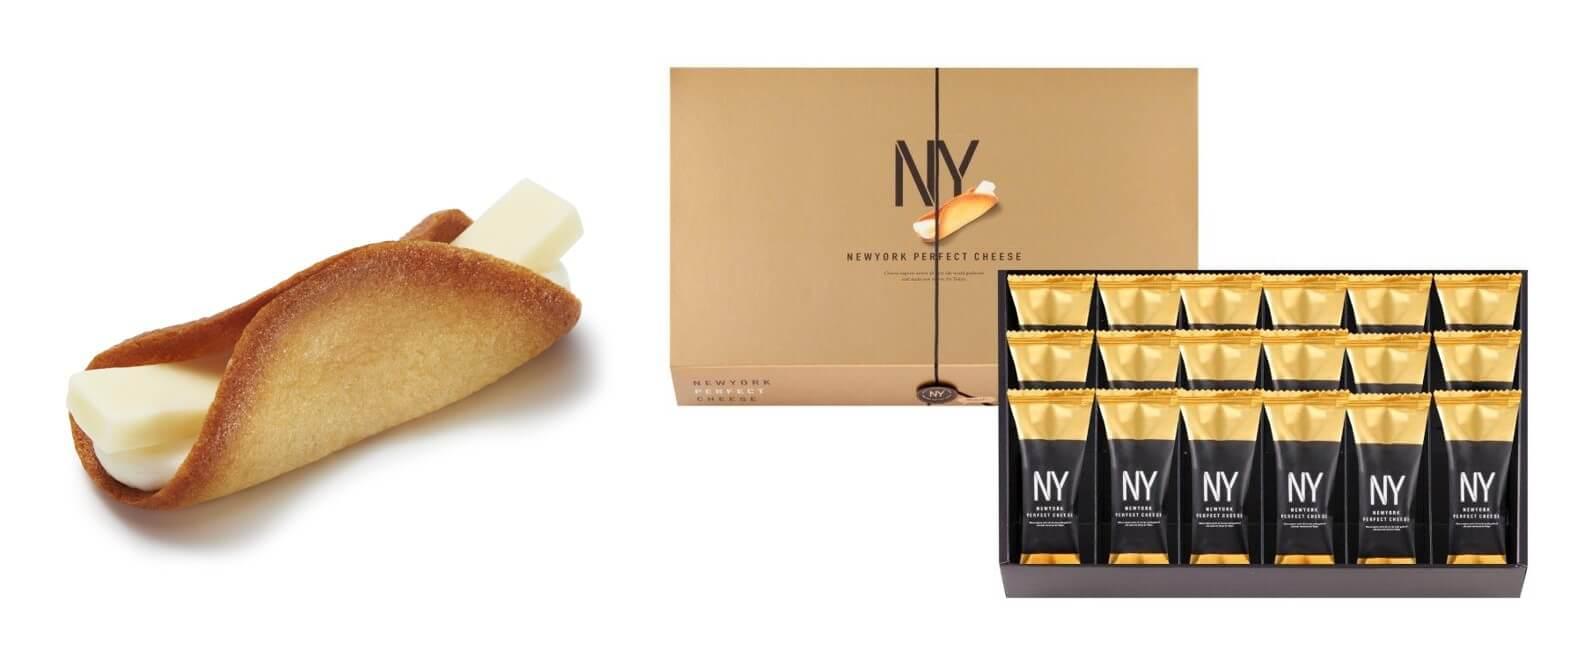 『NEWYORK PERFECT CHEESE(ニューヨークパーフェクトチーズ)』のニューヨークパーフェクトチーズ